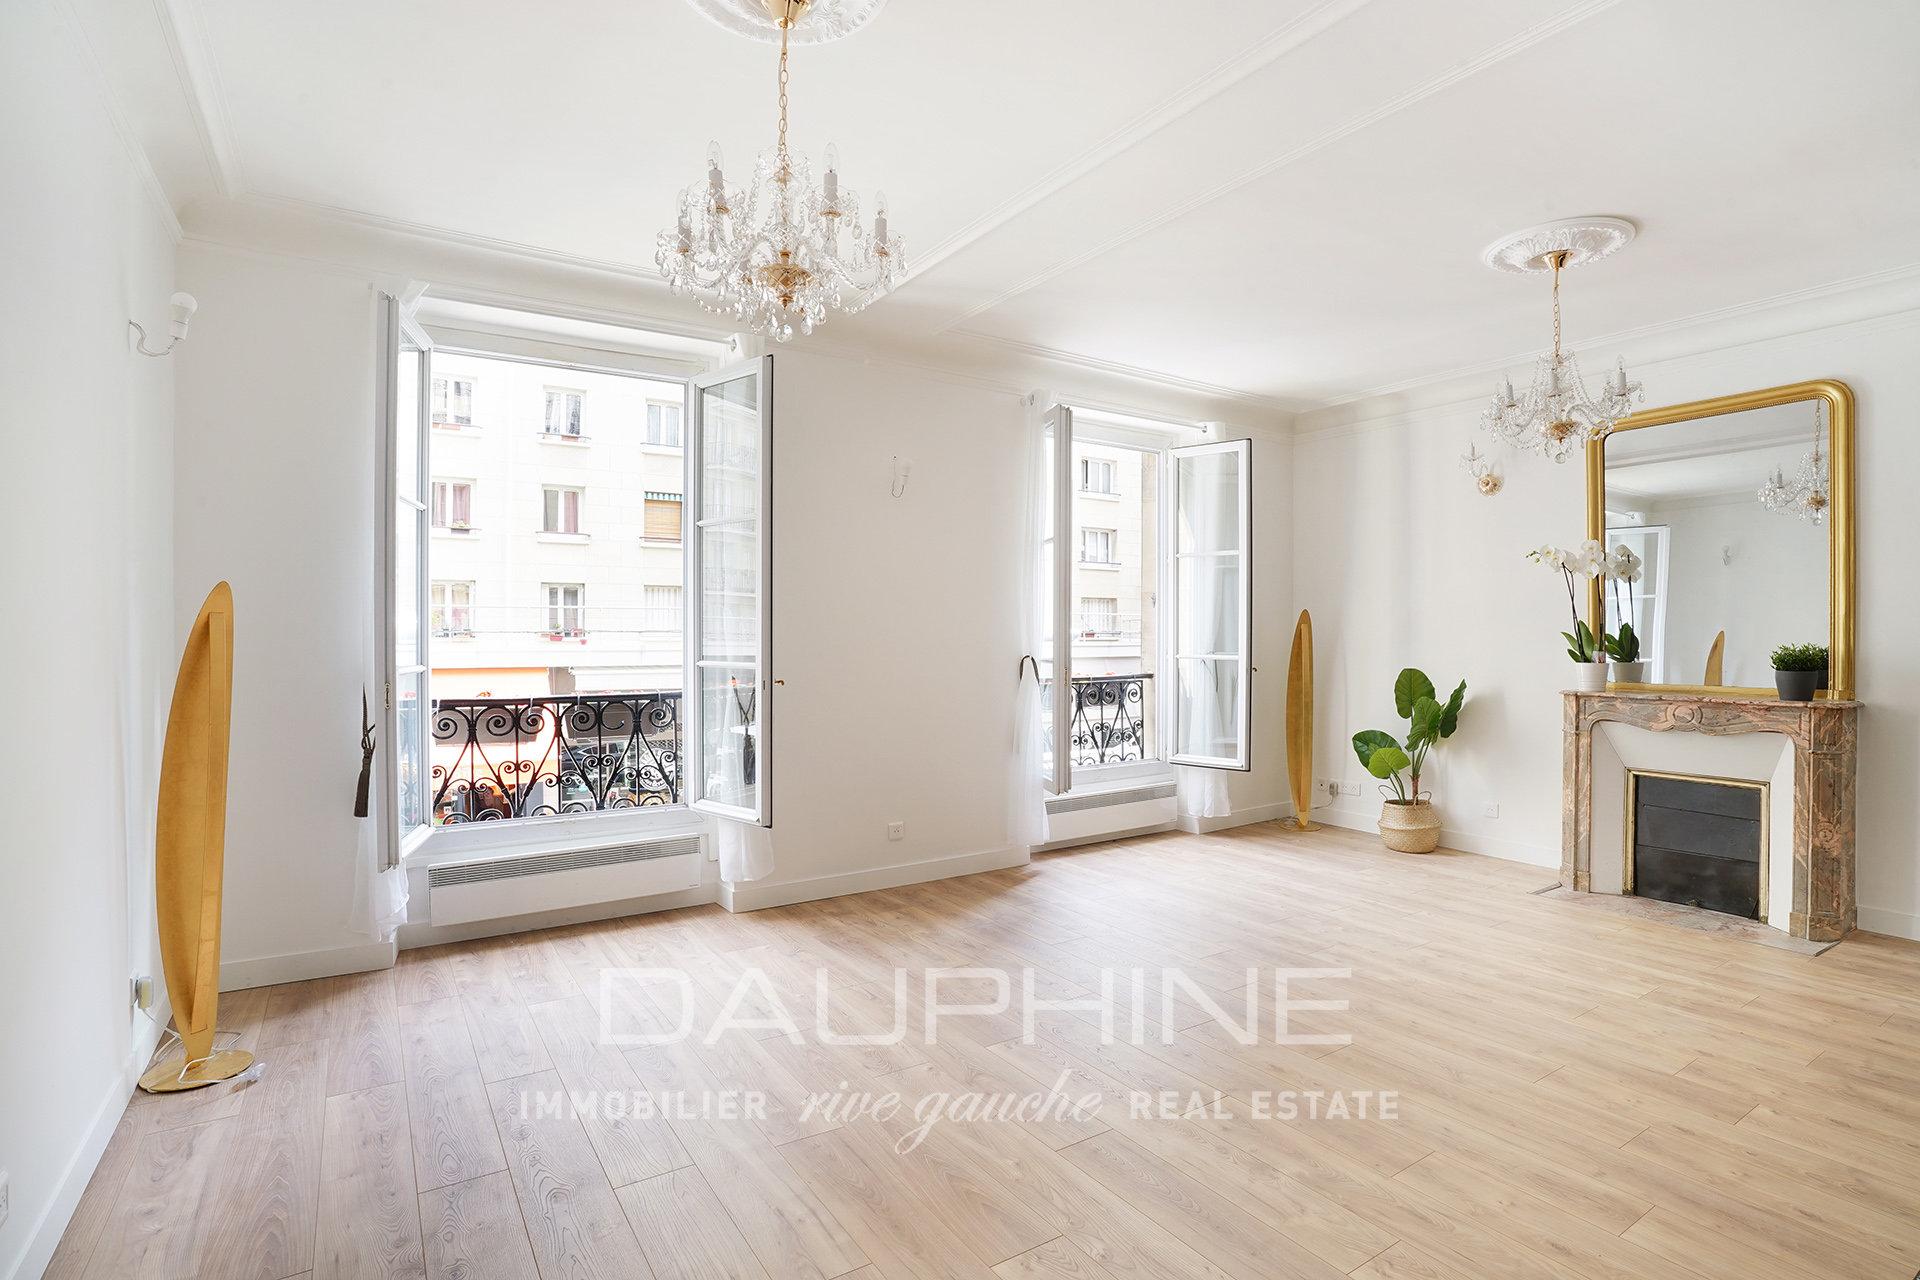 VENTE-3708541-DAUPHINE-RIVE-GAUCHE-PARIS-7e-Paris